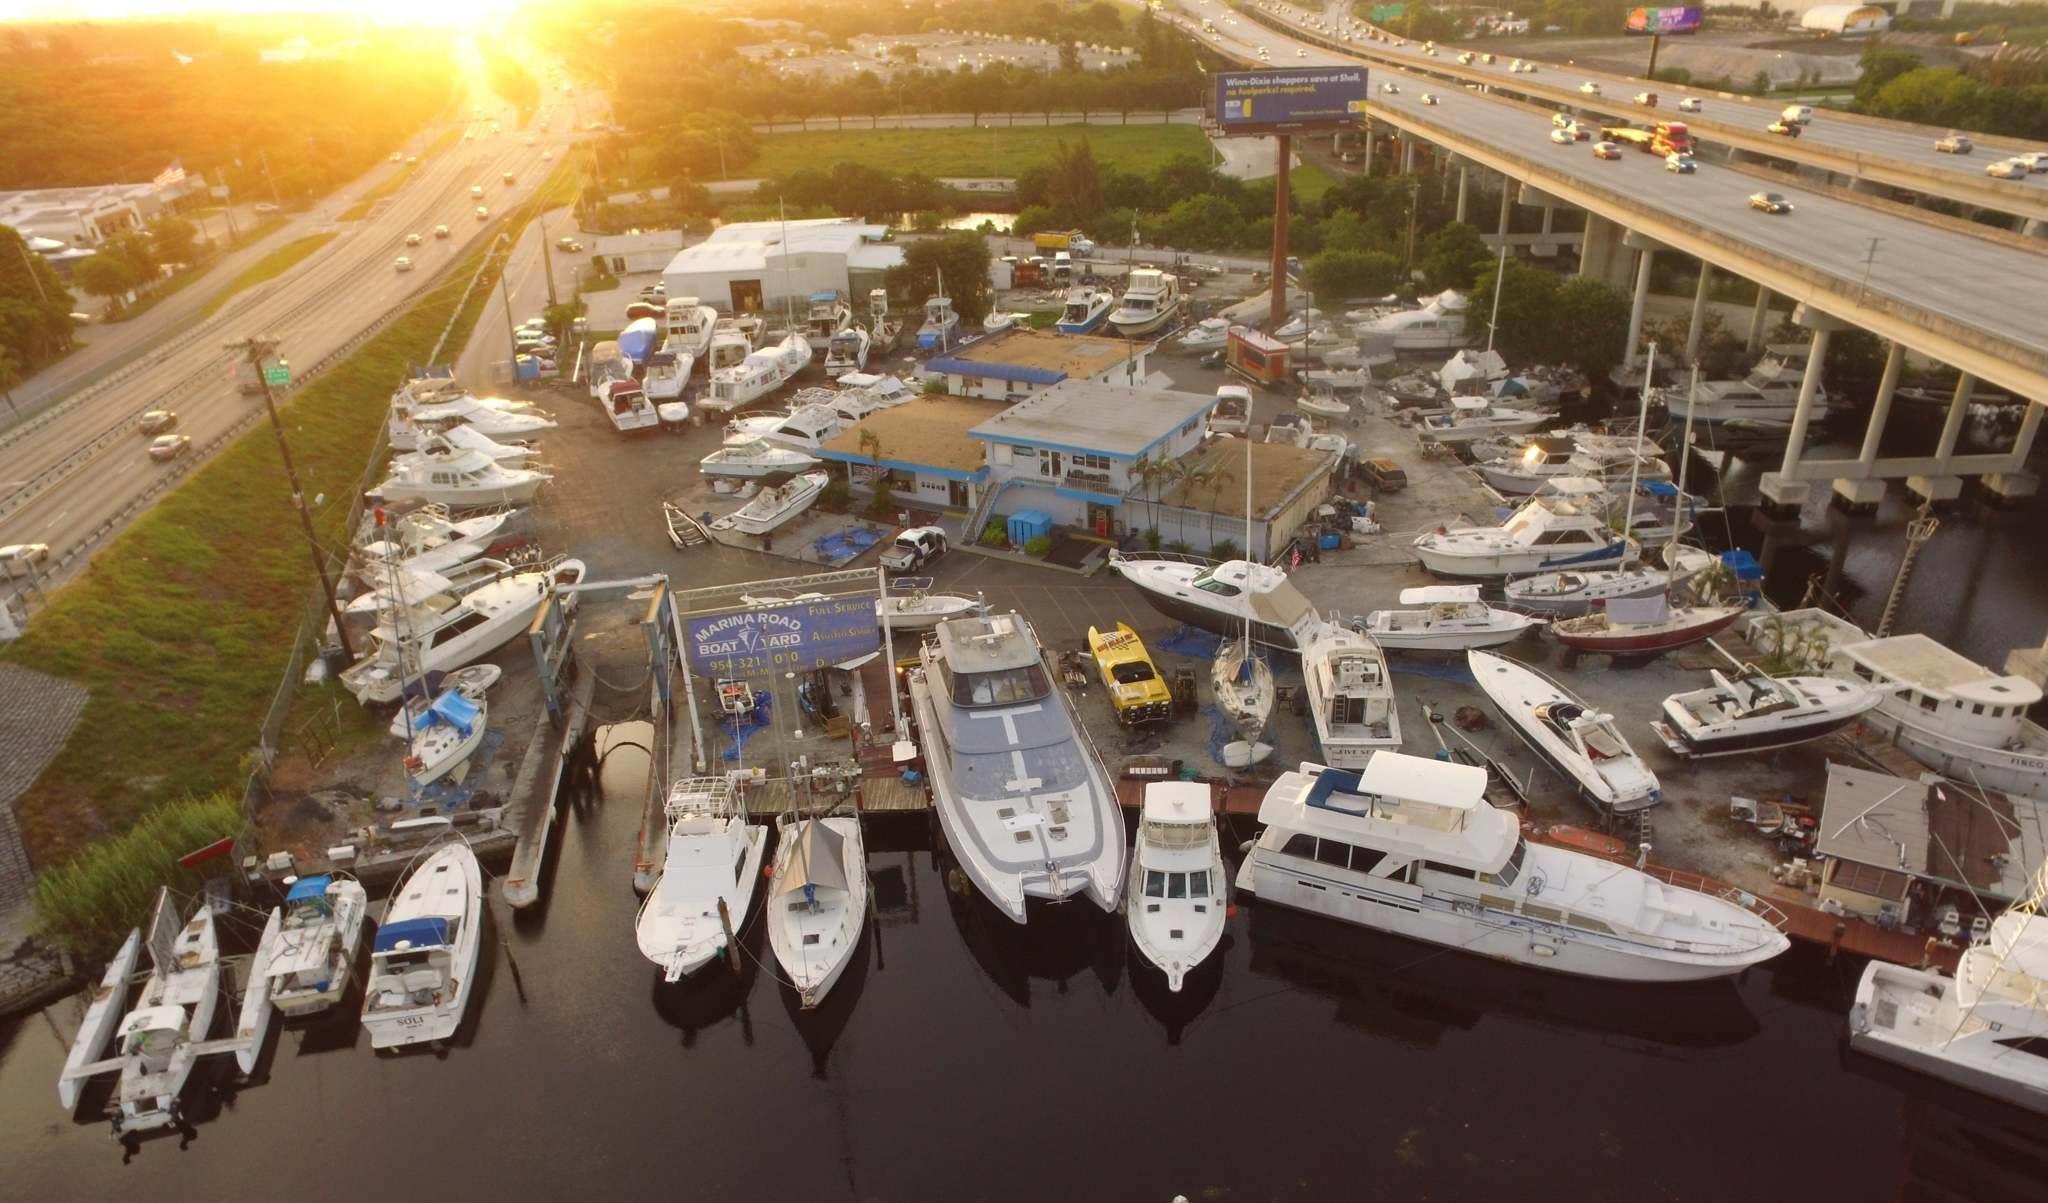 Marina Road Boat Yard marinas in Ft. Lauderdale, Florida